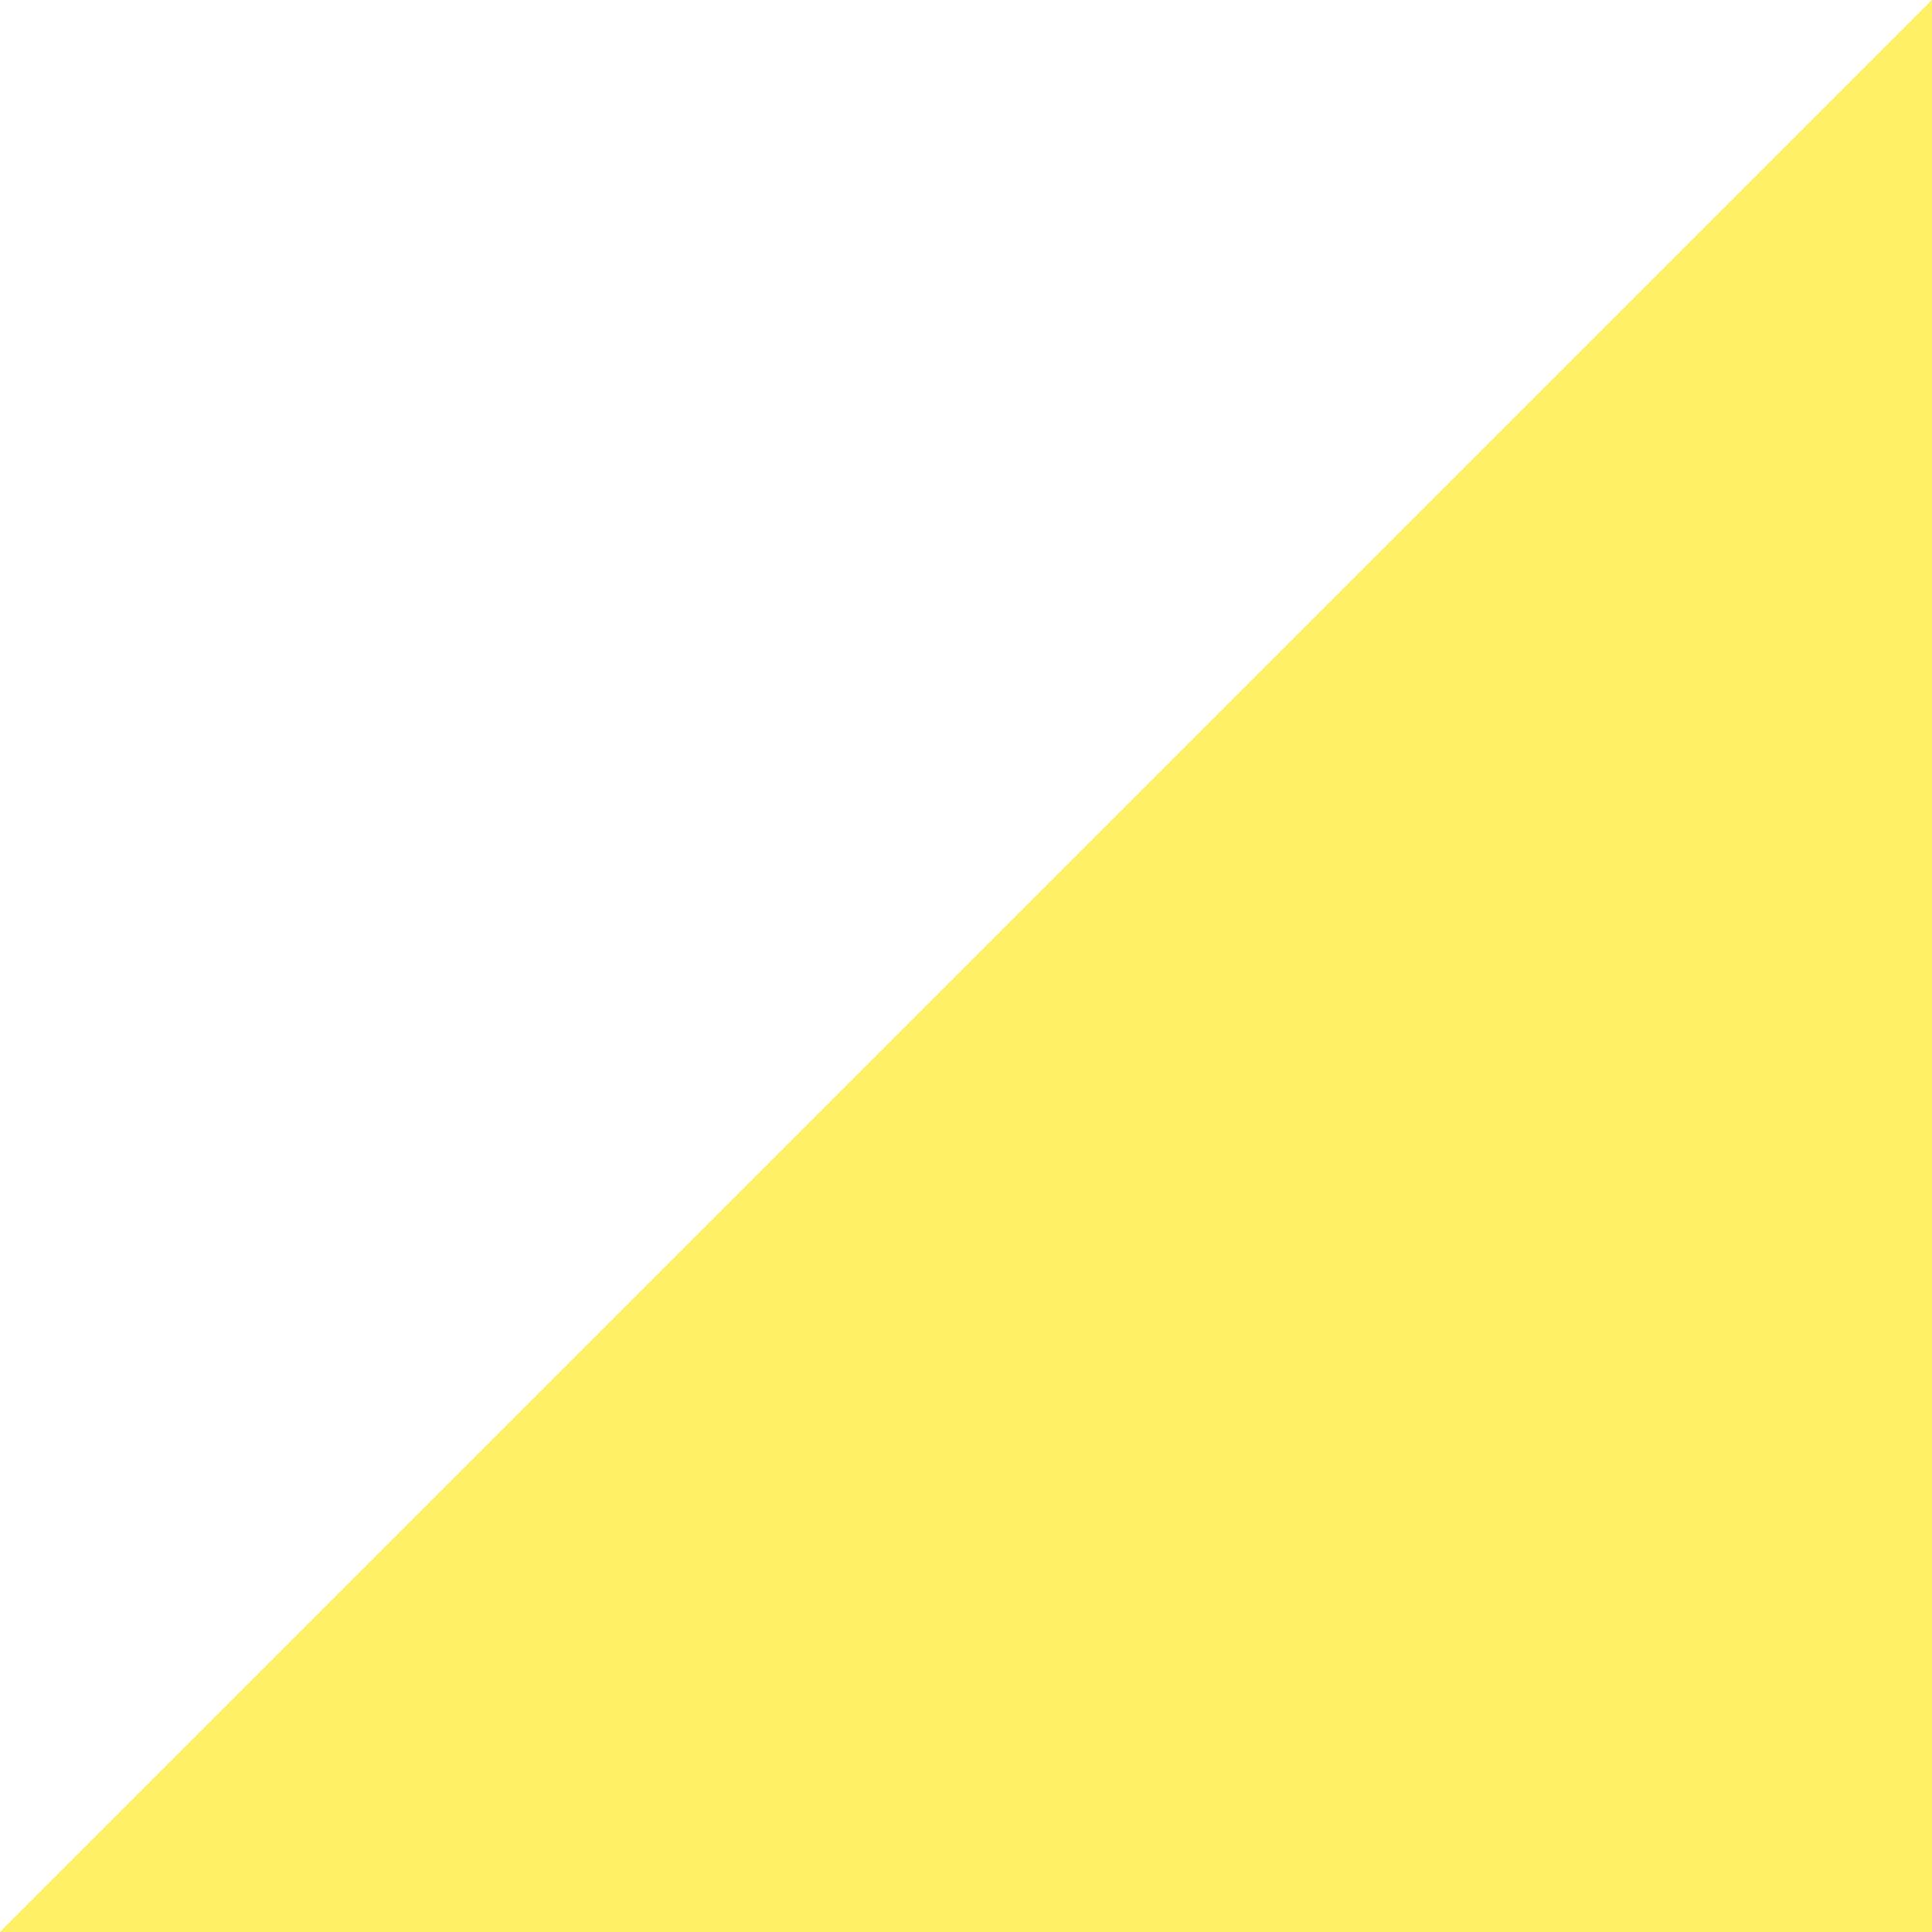 triangle header